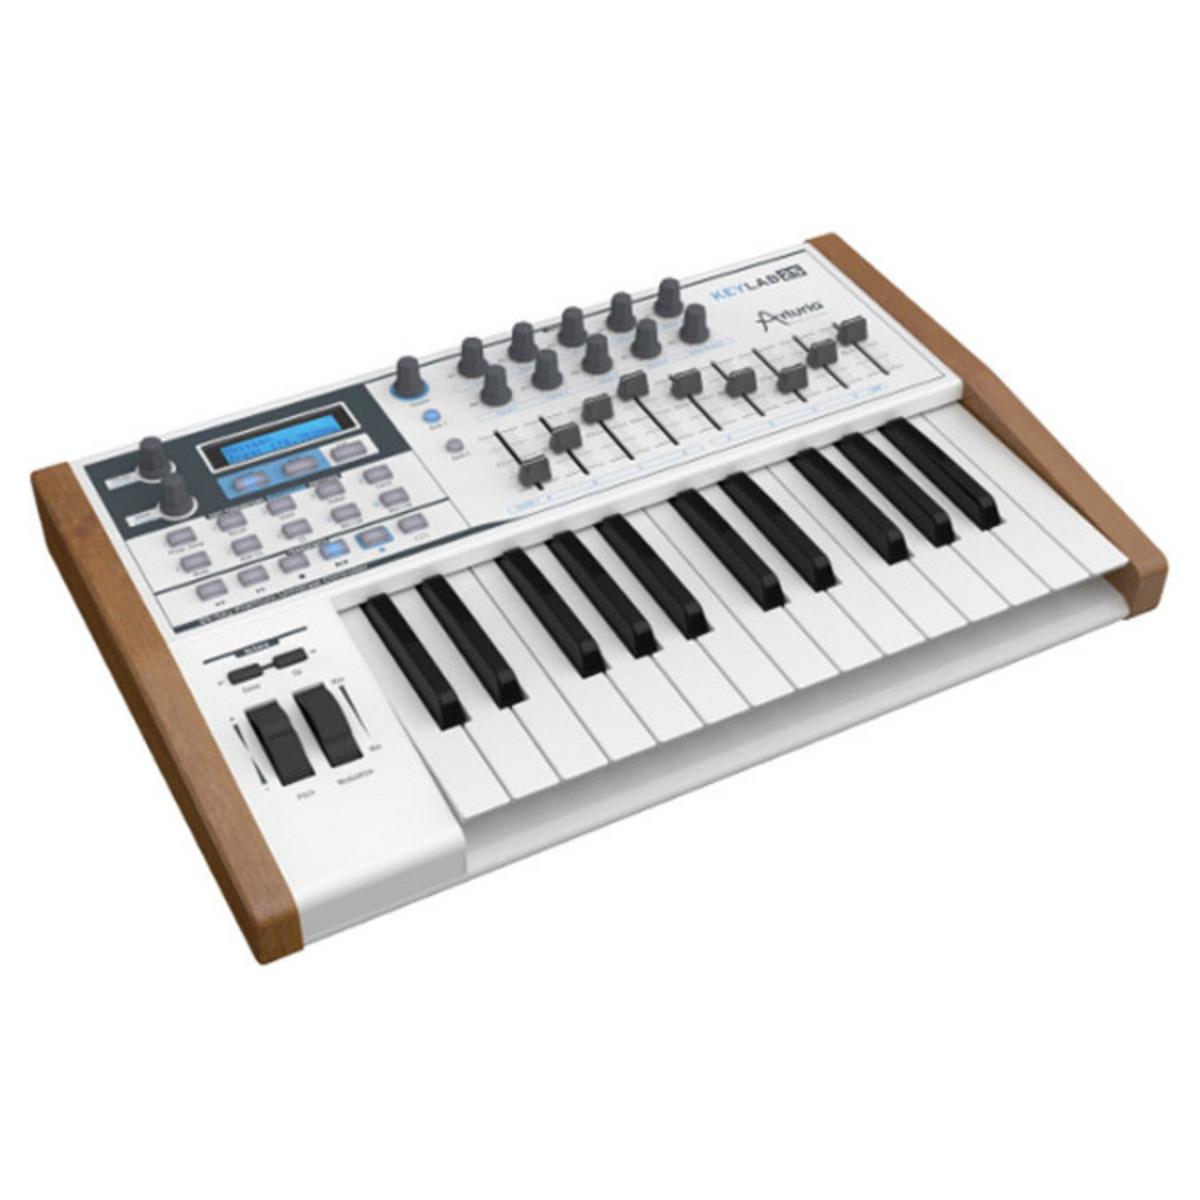 Image of Arturia KeyLab 25 MIDI Controller Keyboard